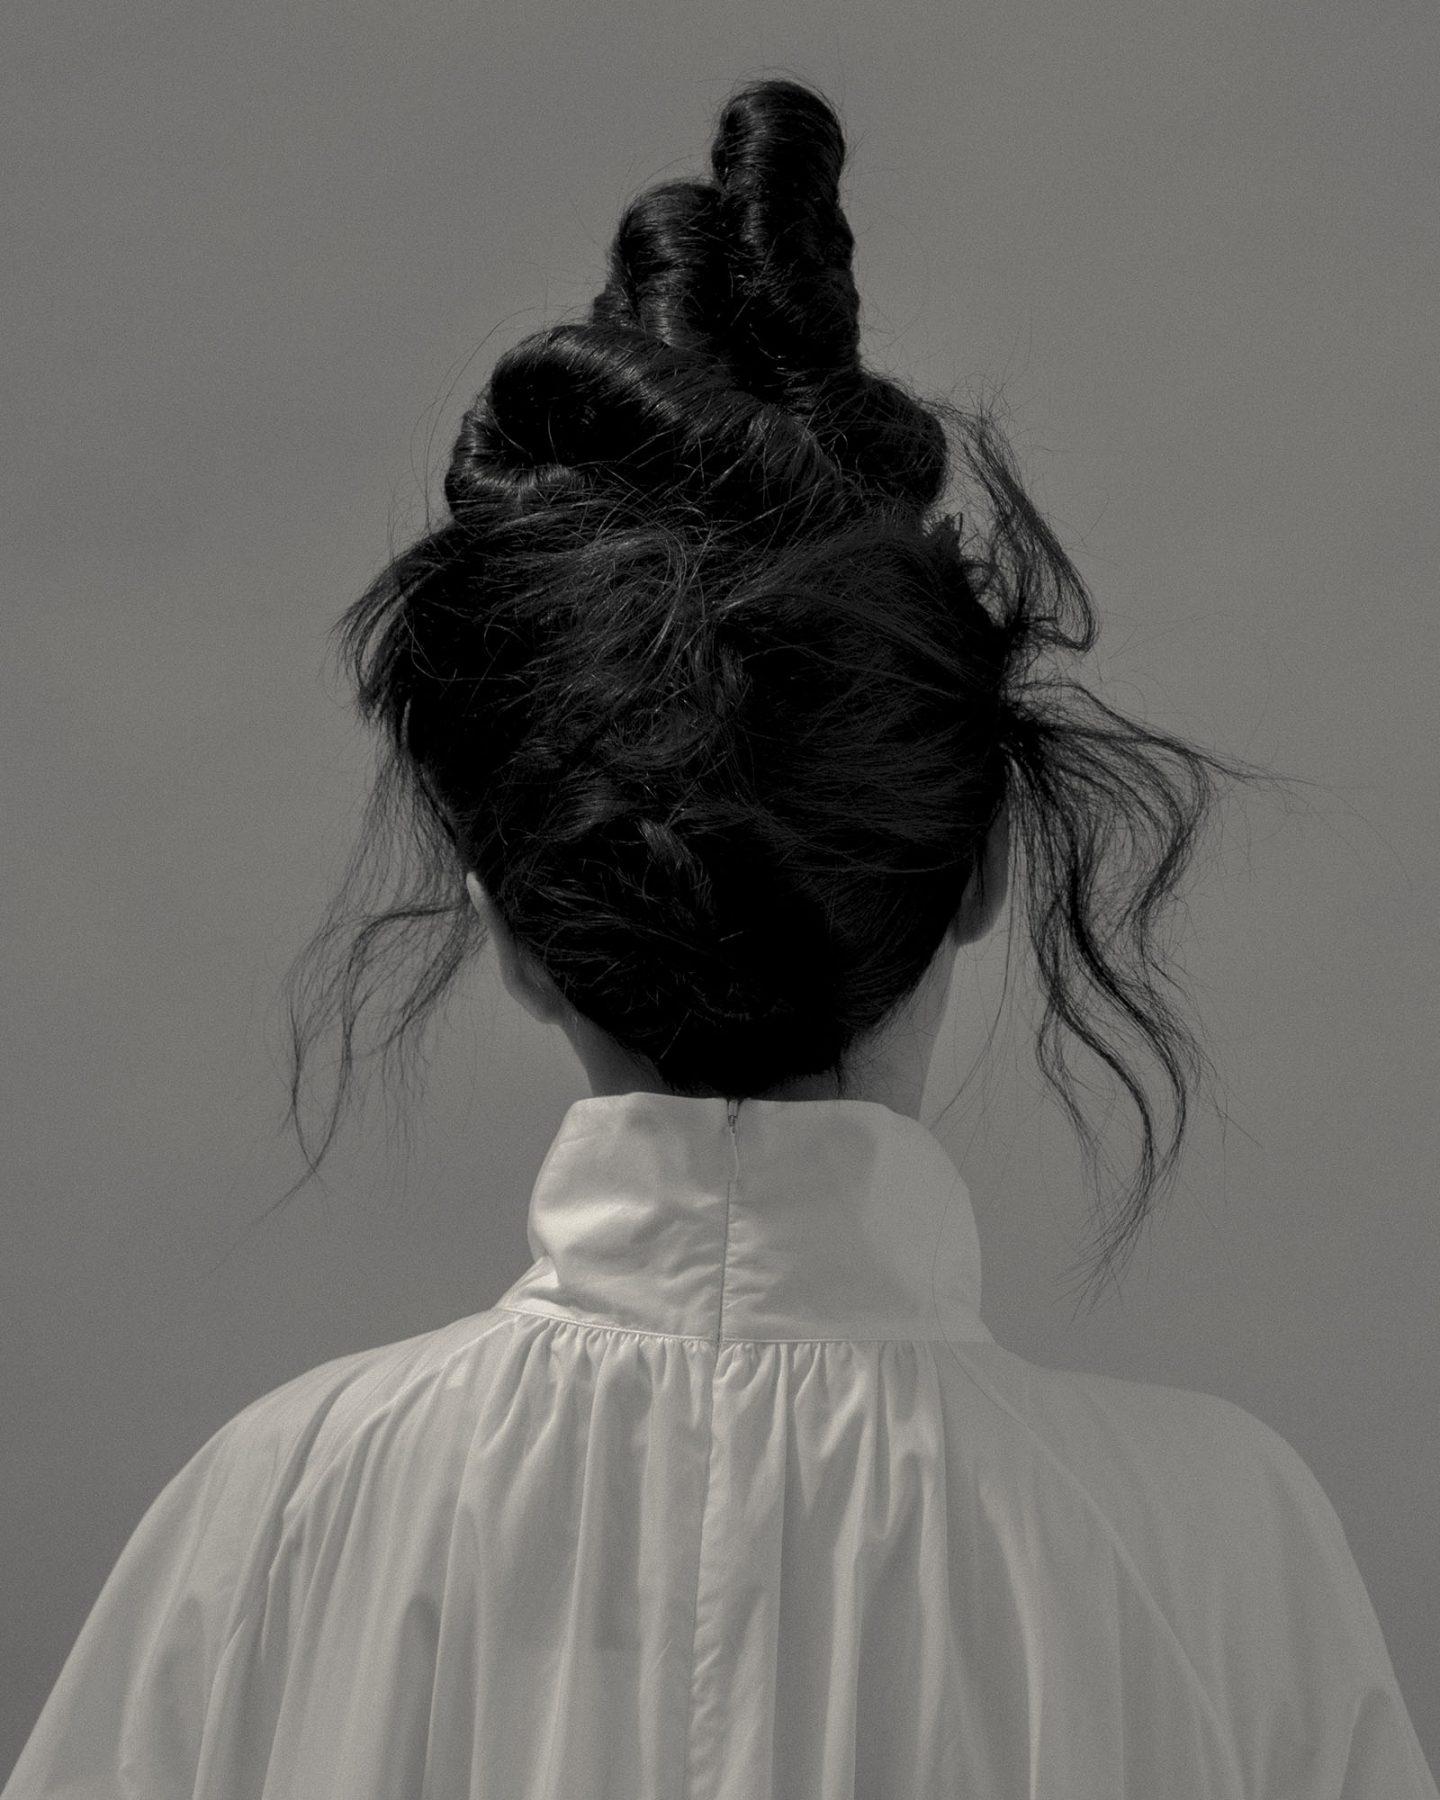 IGNANT-Photography-Paul-Phung-Toufa-Hair-01